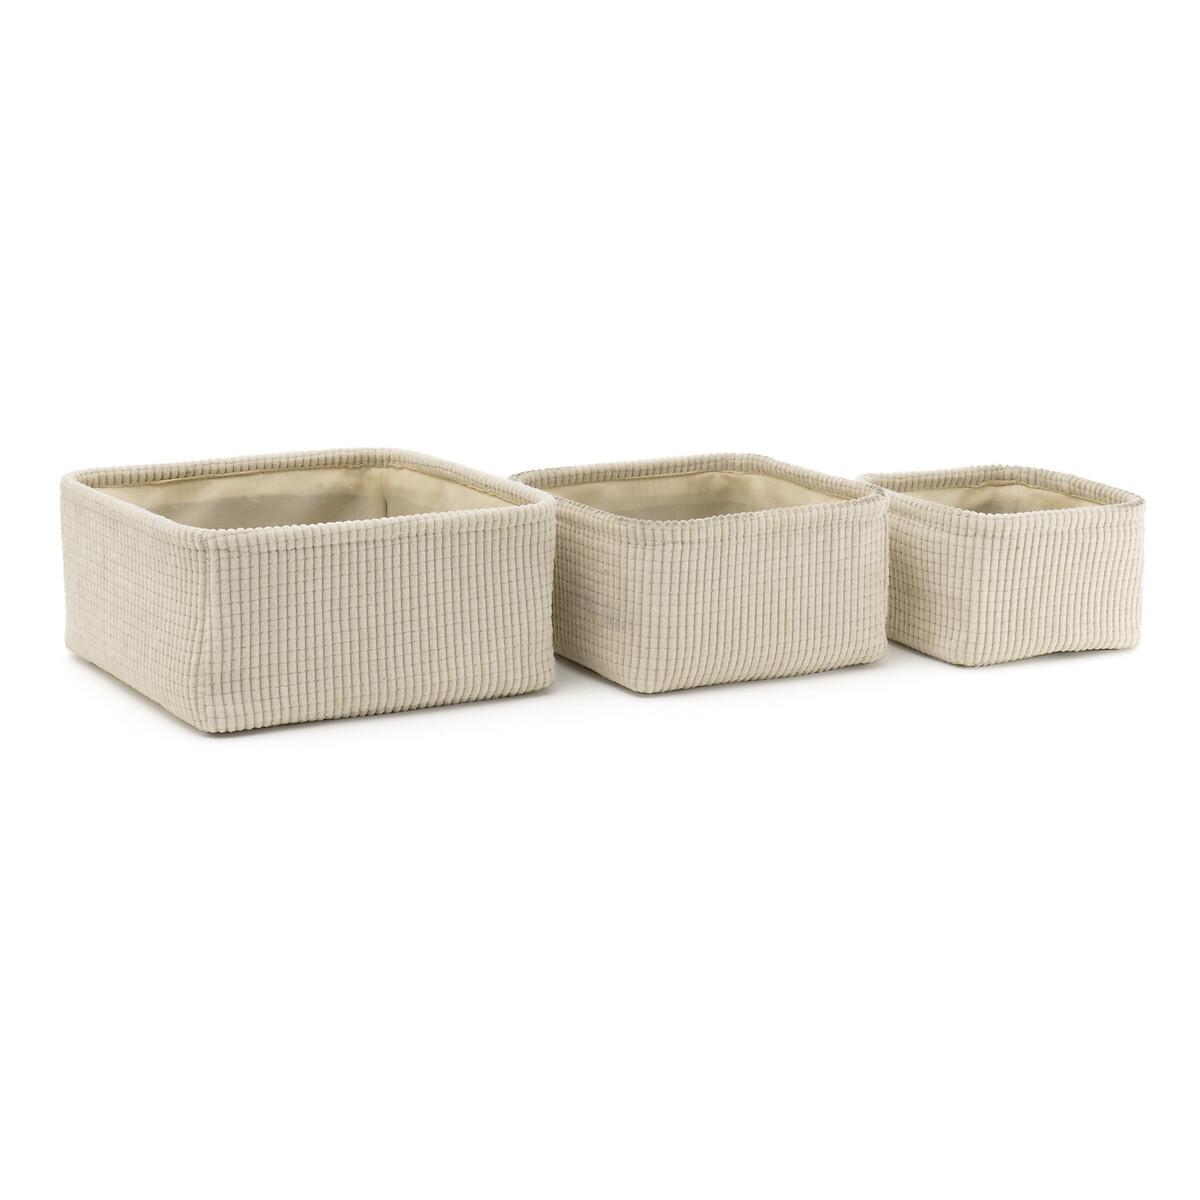 Комплект из 3 корзин, Veloudo LaRedoute La Redoute единый размер бежевый